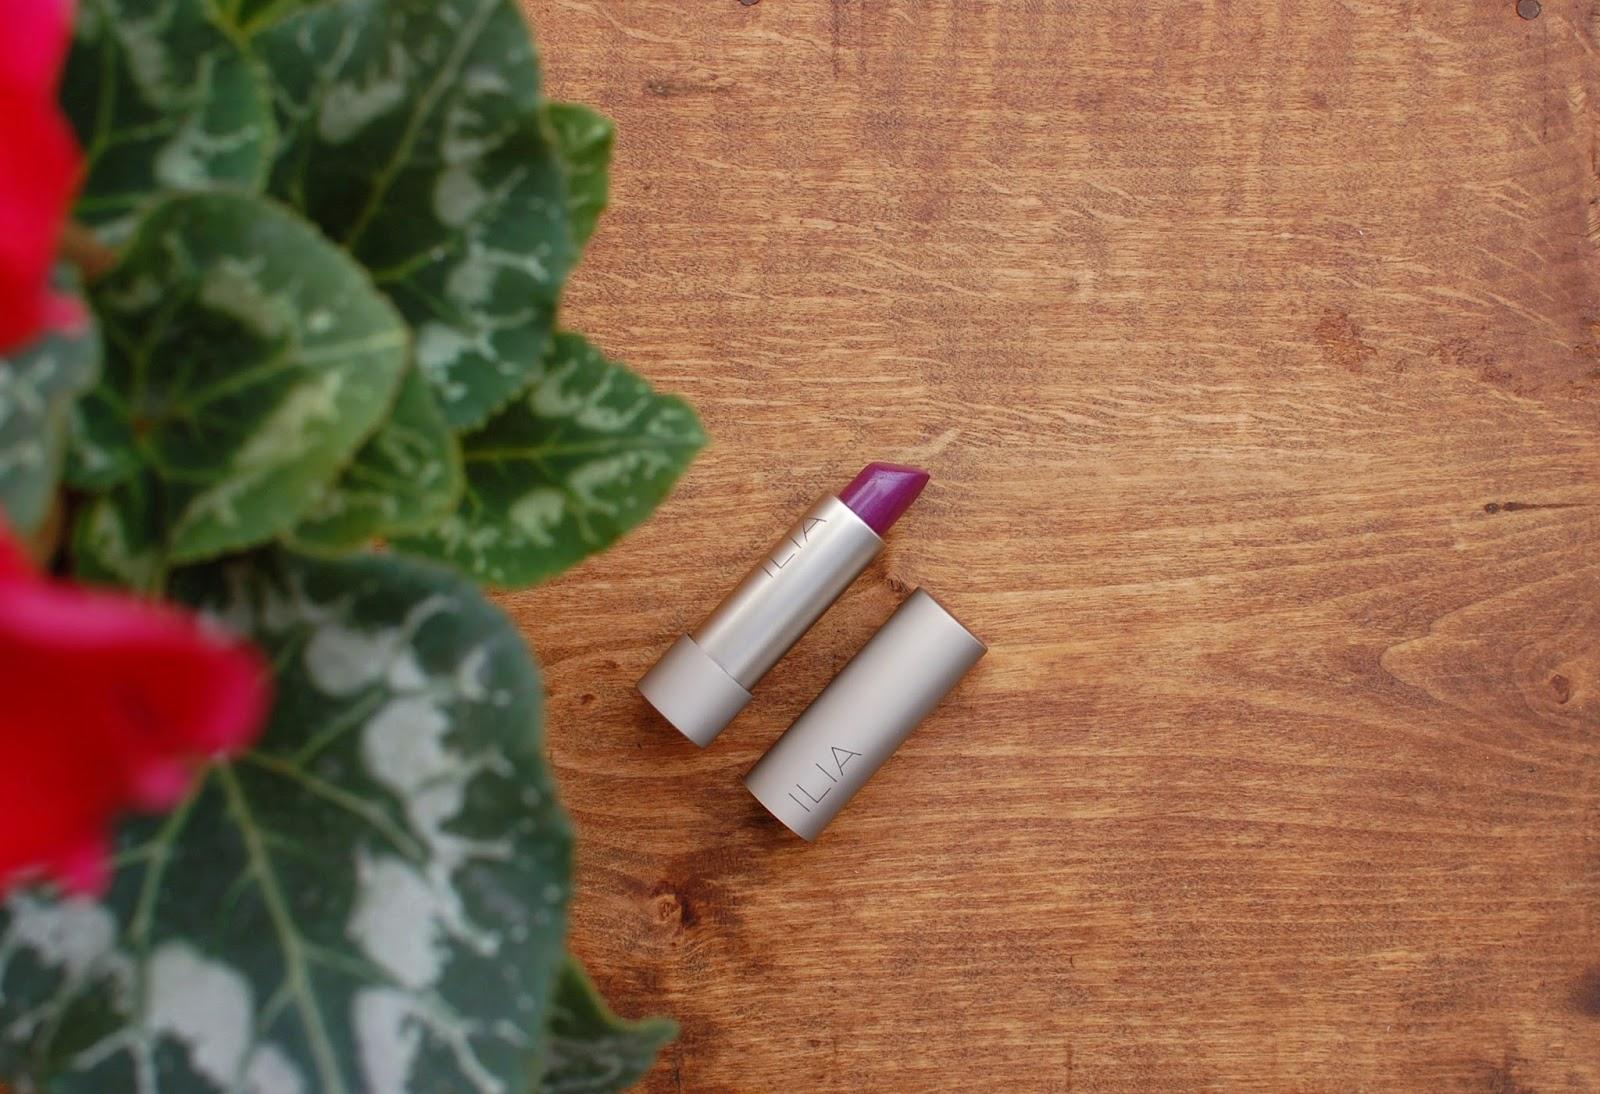 Ilia Beauty Lipstick shade Ink Pot